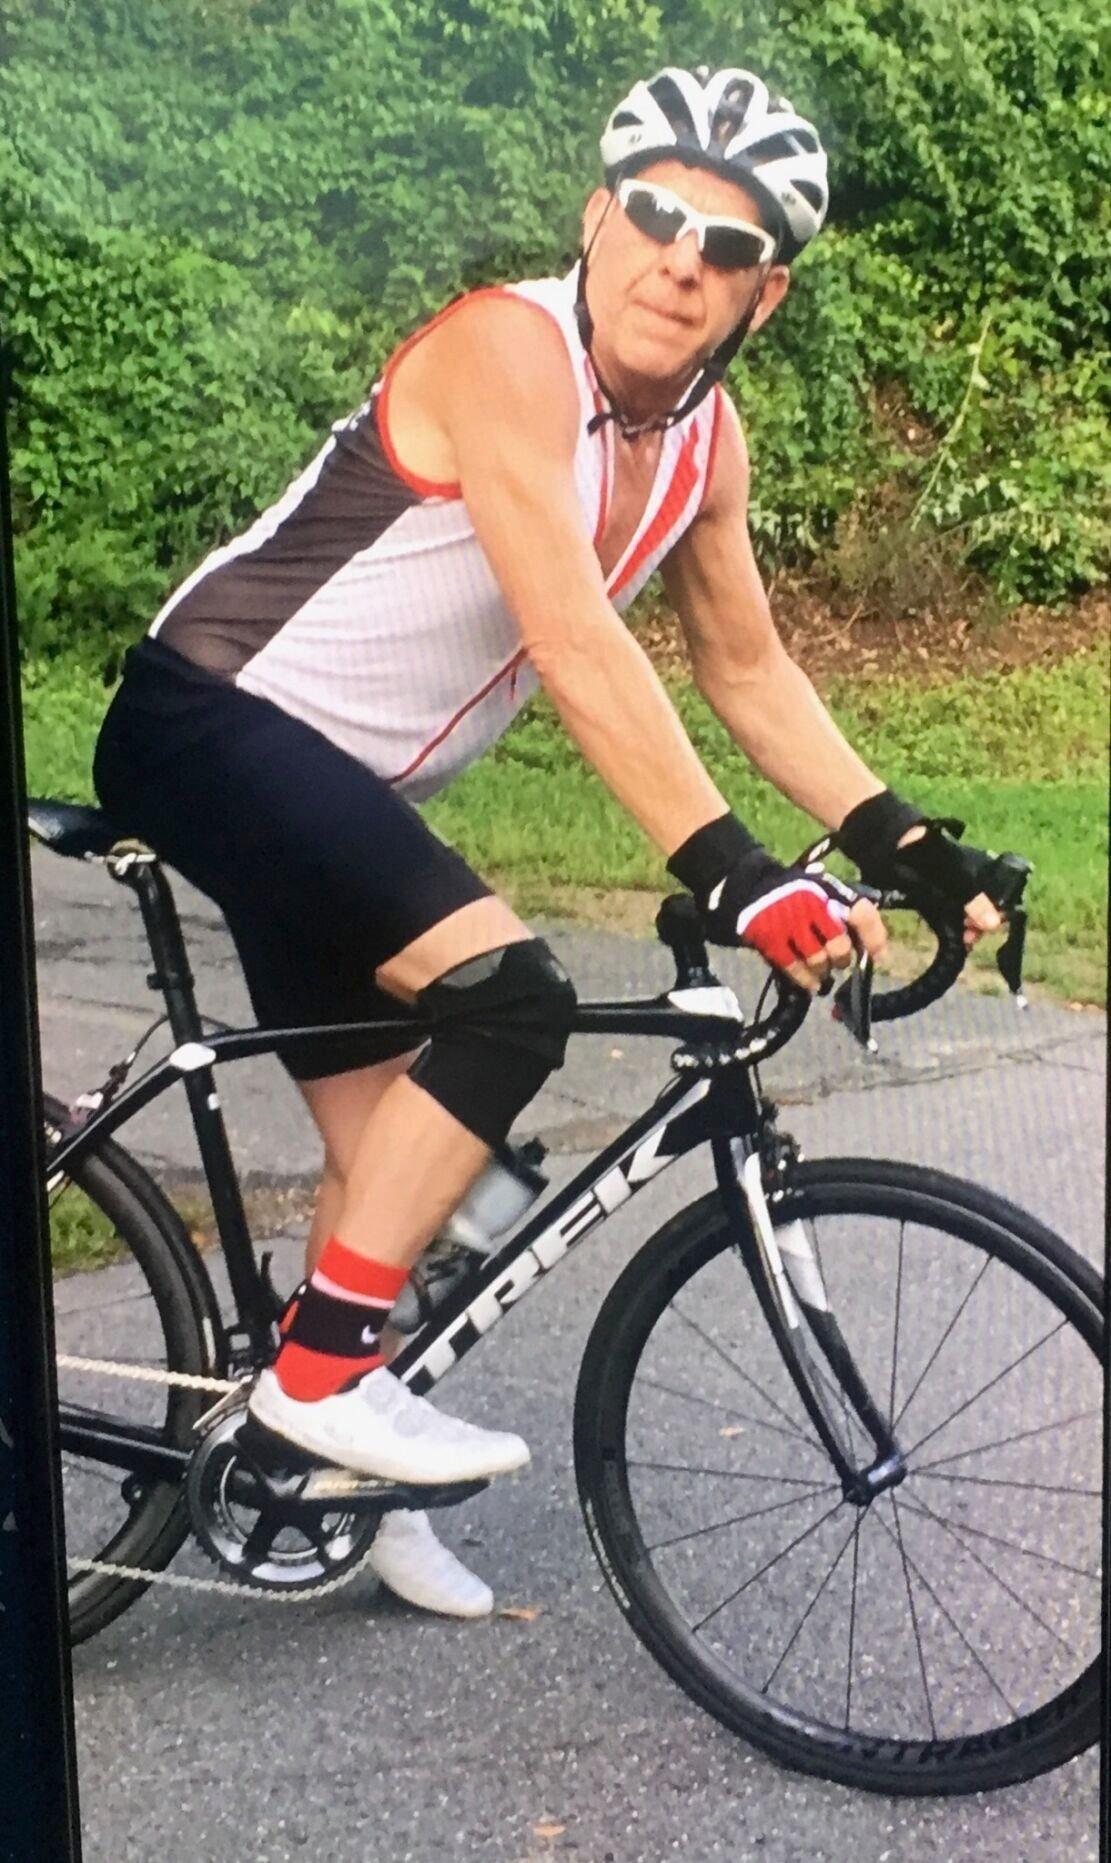 bike_arlington_suspect.jpg